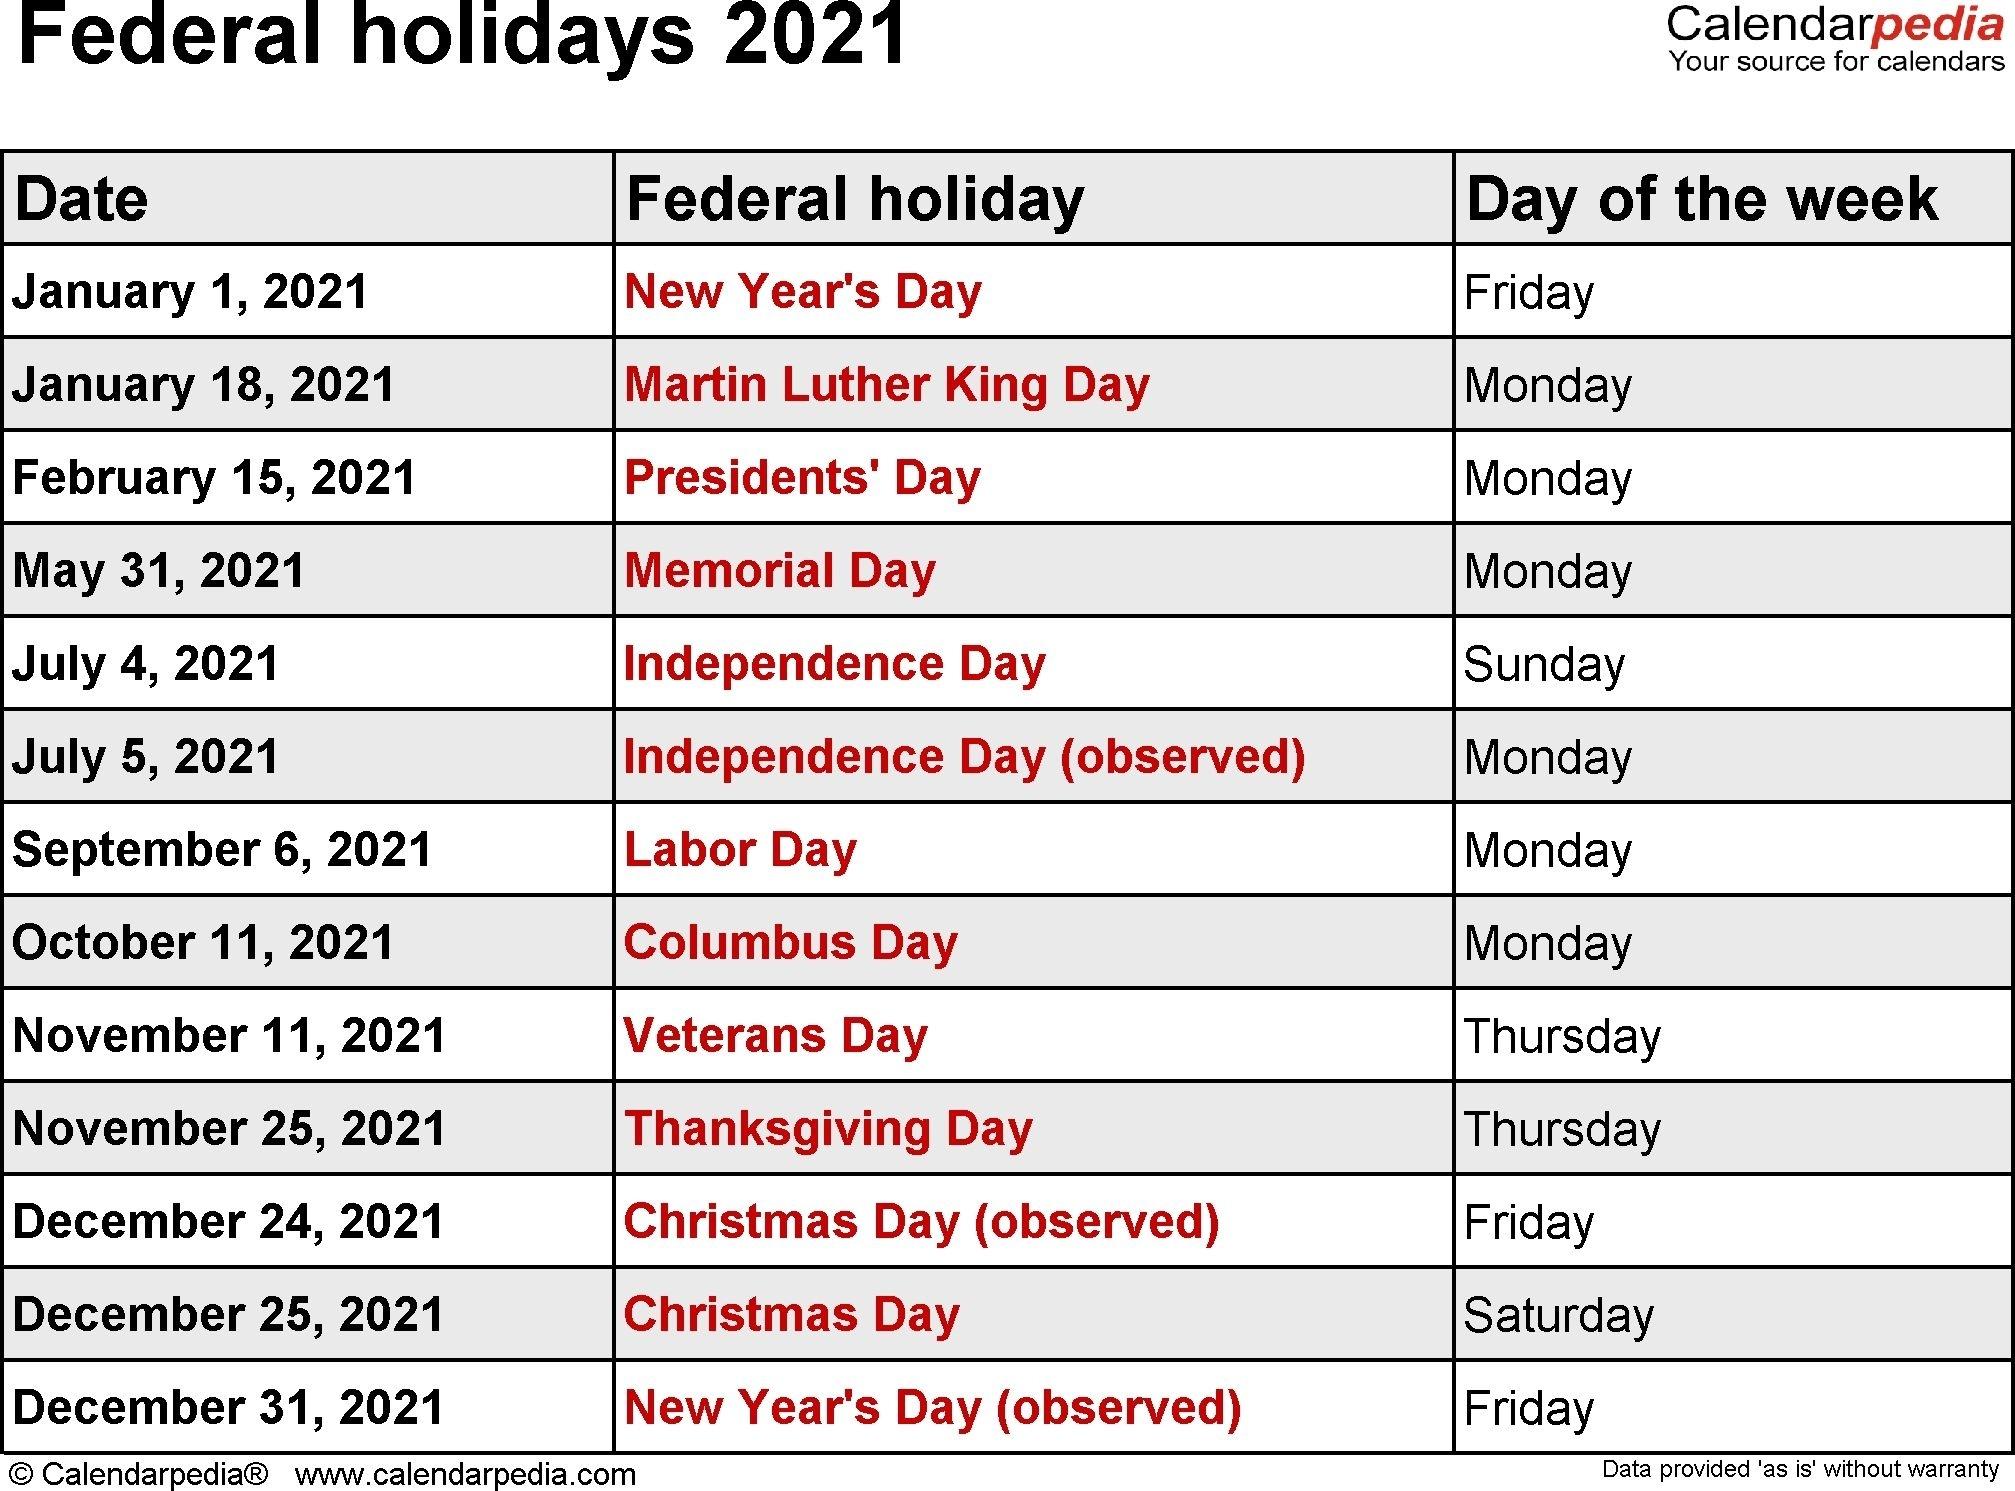 Federal Holidays 2021 Dowload | Holiday Calendar Printable